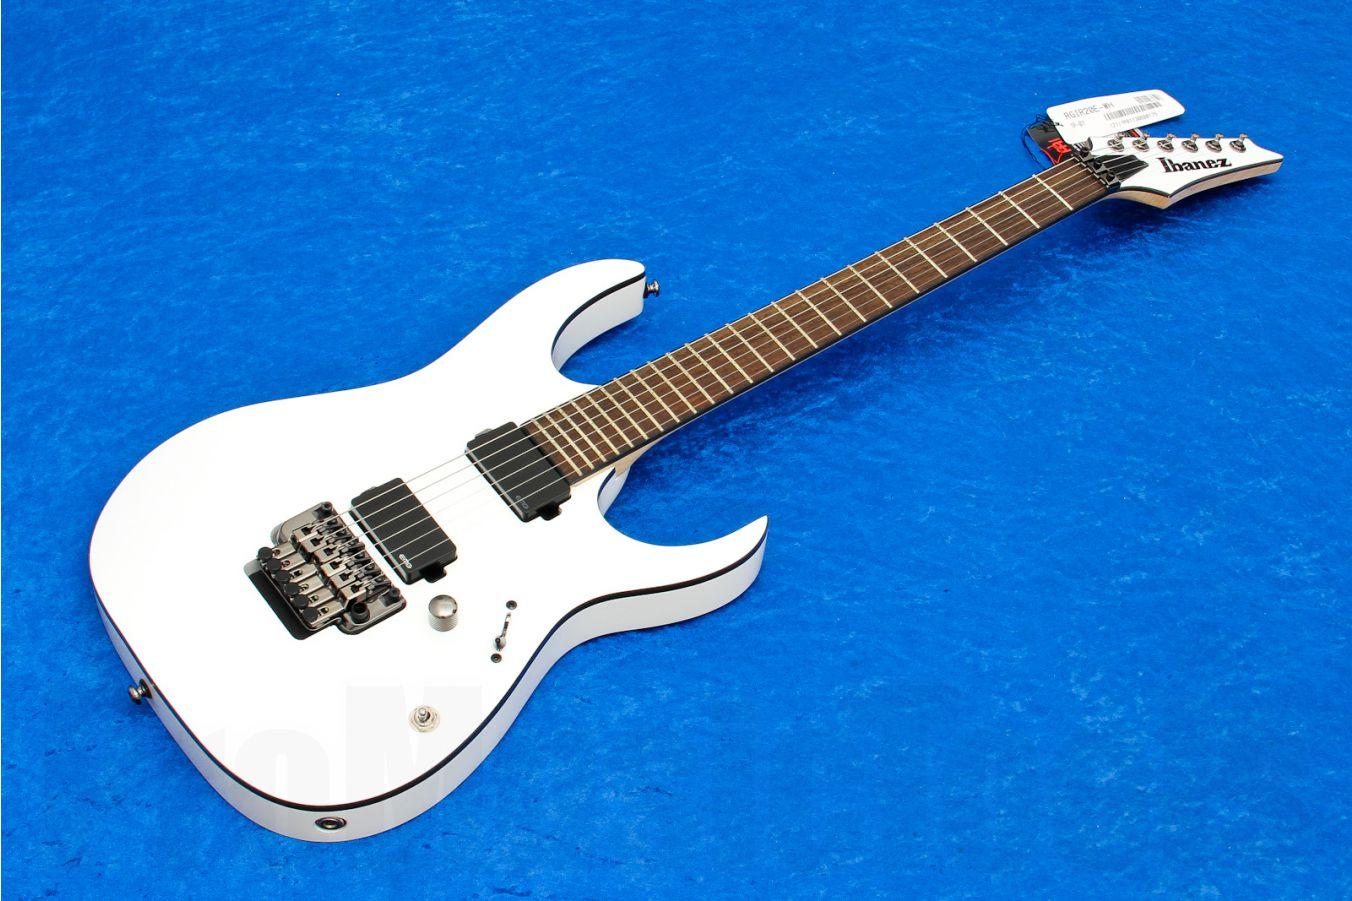 Ibanez RGIR20E WH - White - Iron Label - b-stock